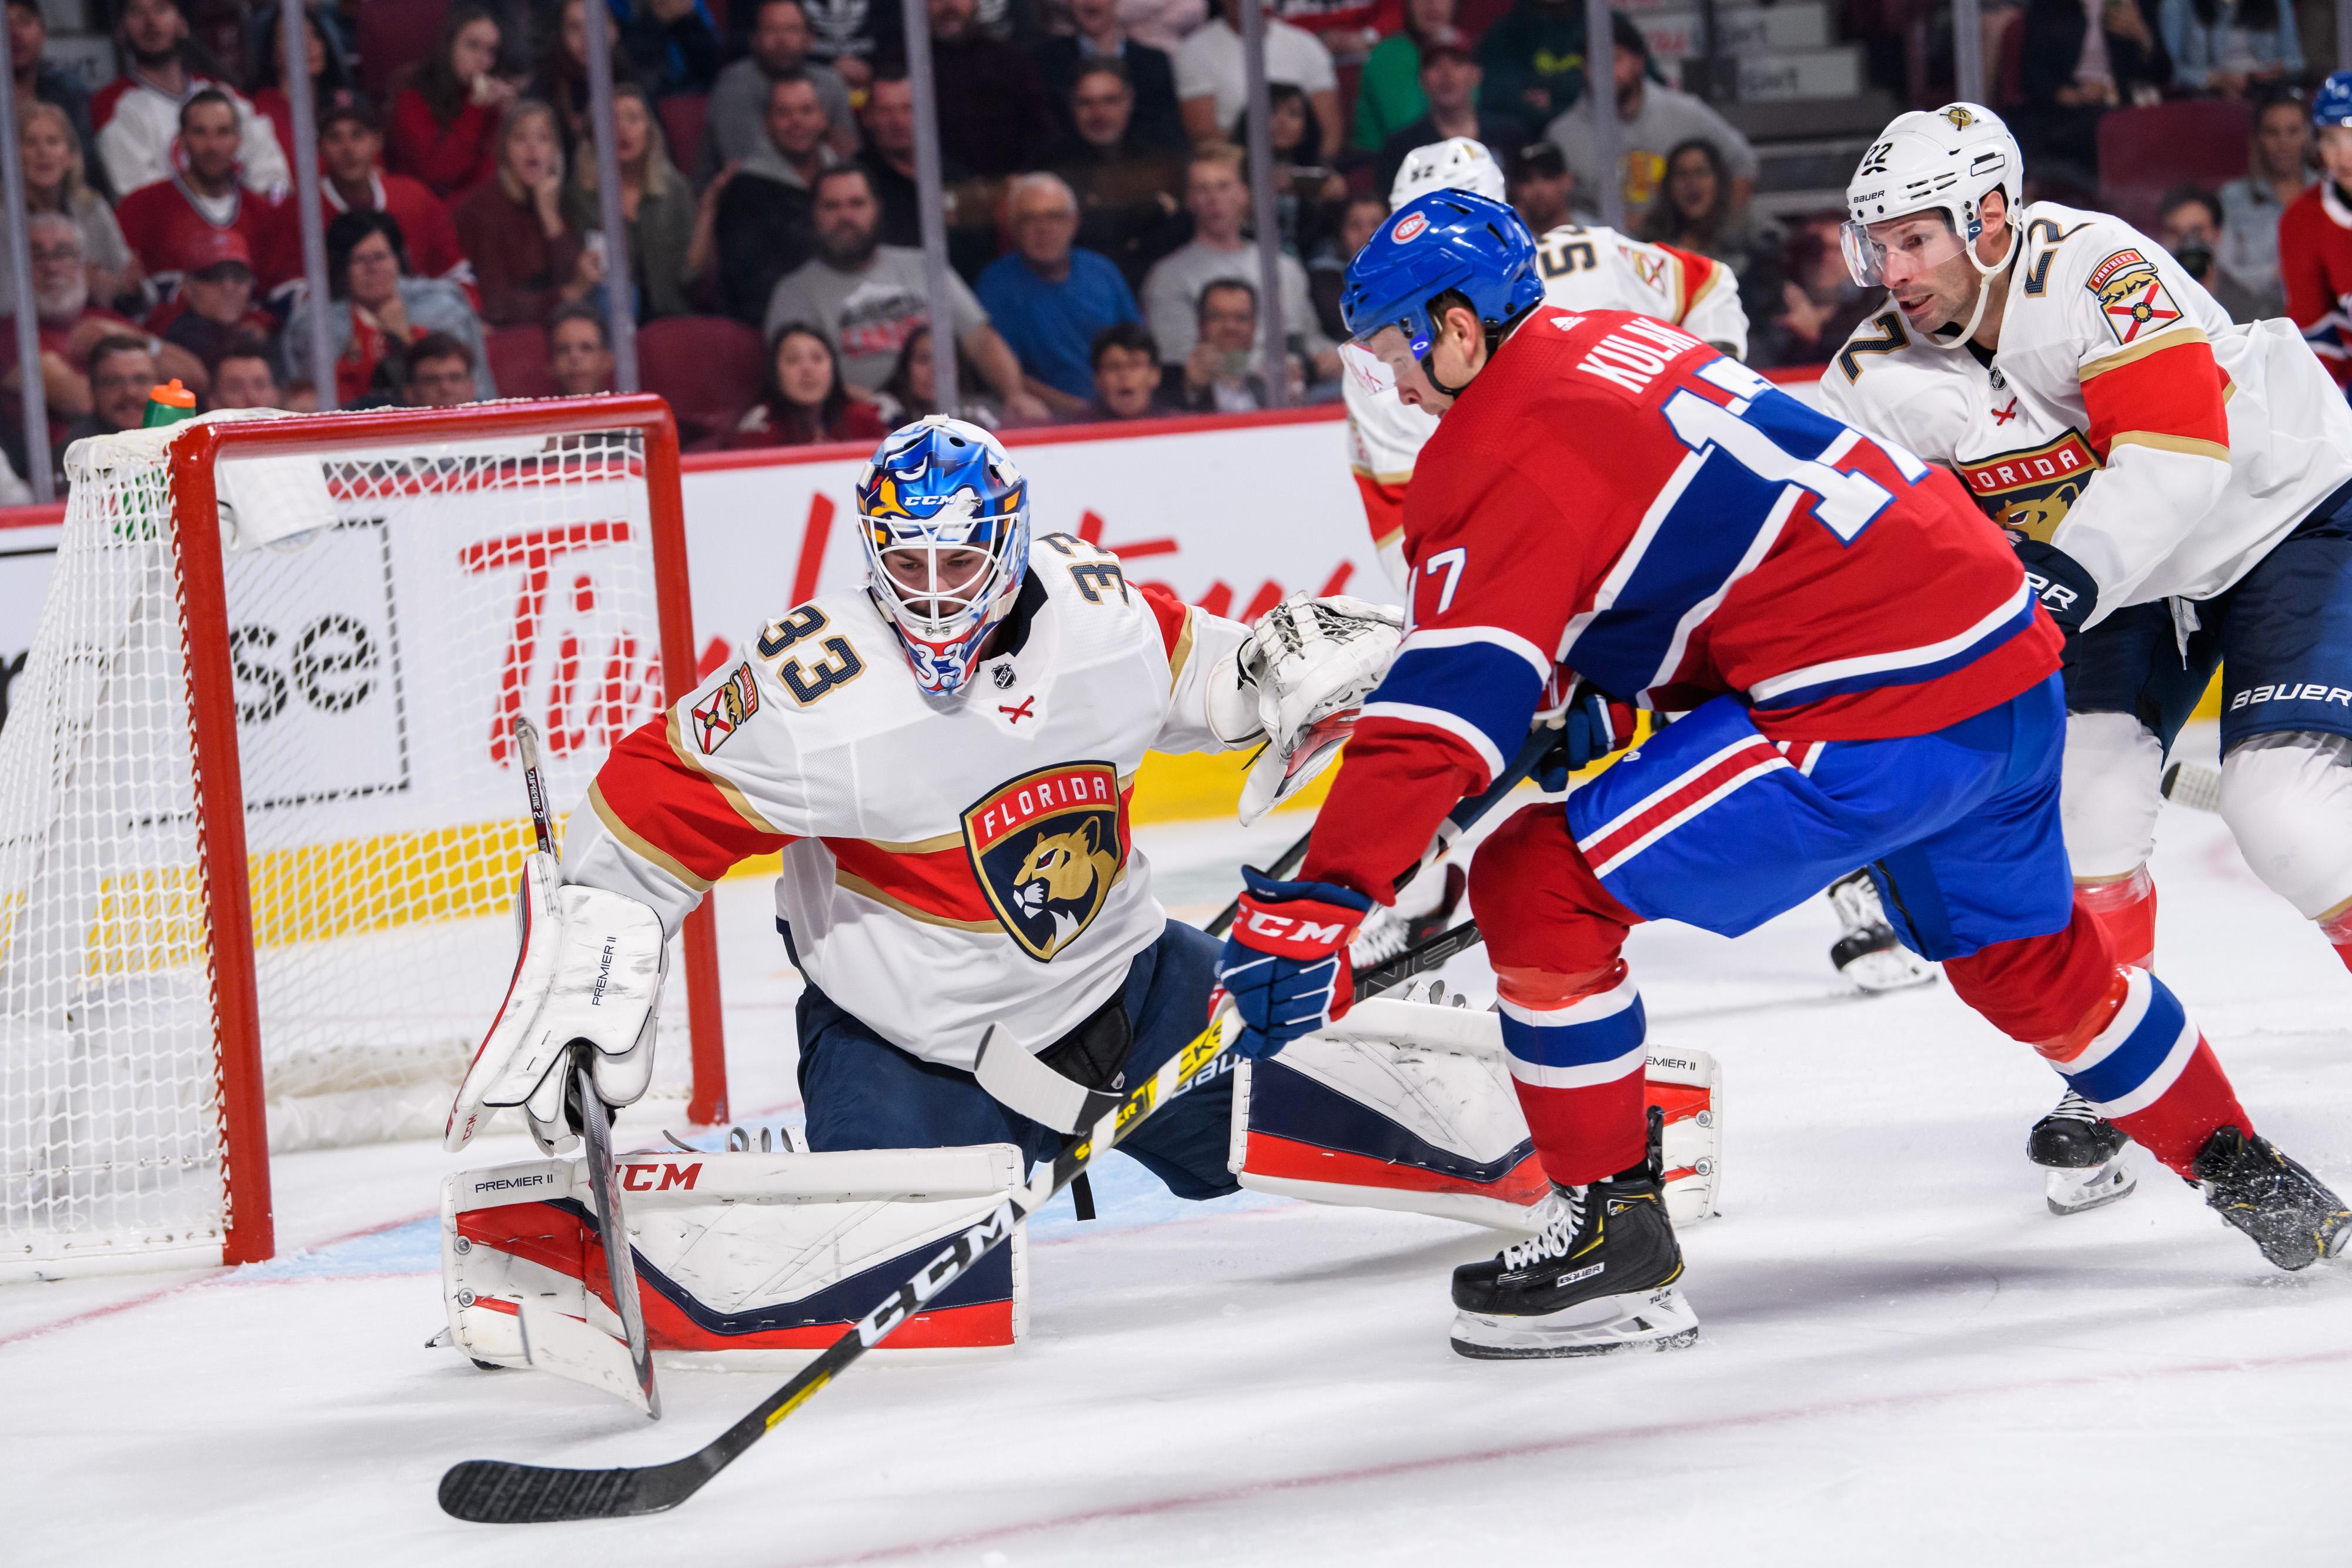 NHL: SEP 19 Preseason - Panthers at Canadiens